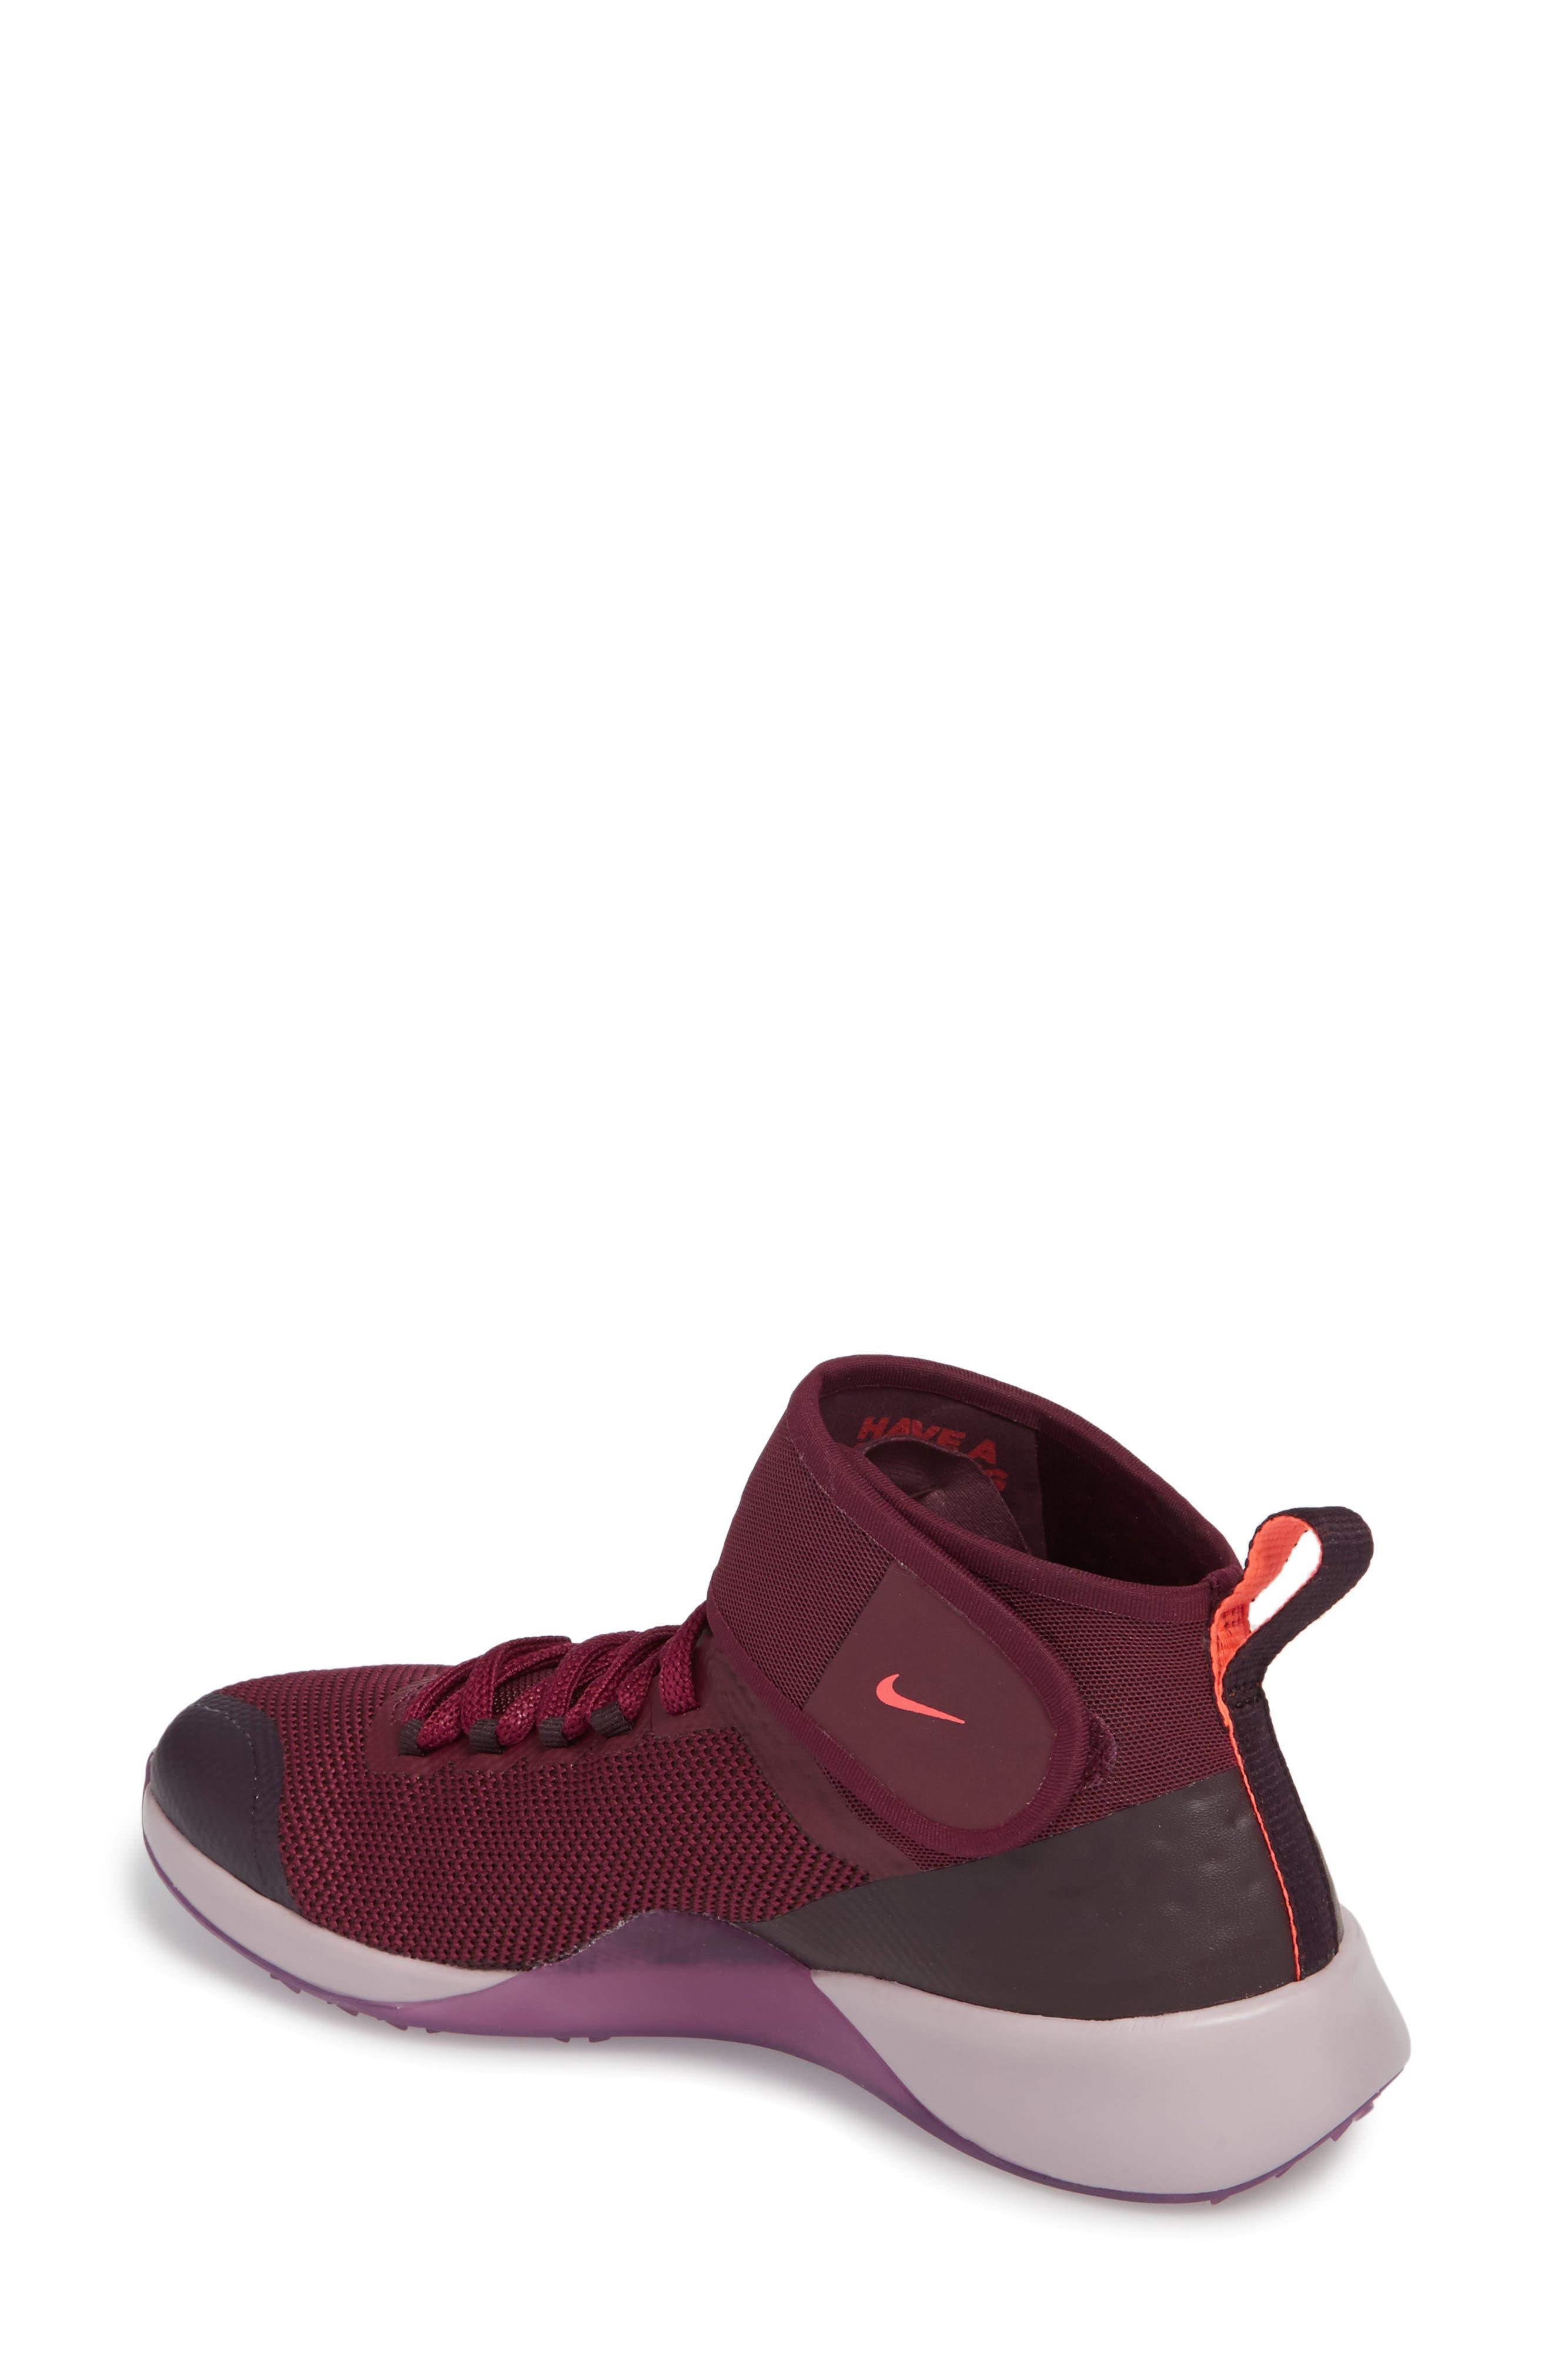 Air Zoom Strong 2 Gem Training Shoe,                             Alternate thumbnail 2, color,                             Bordeaux/ Metallic Pewter